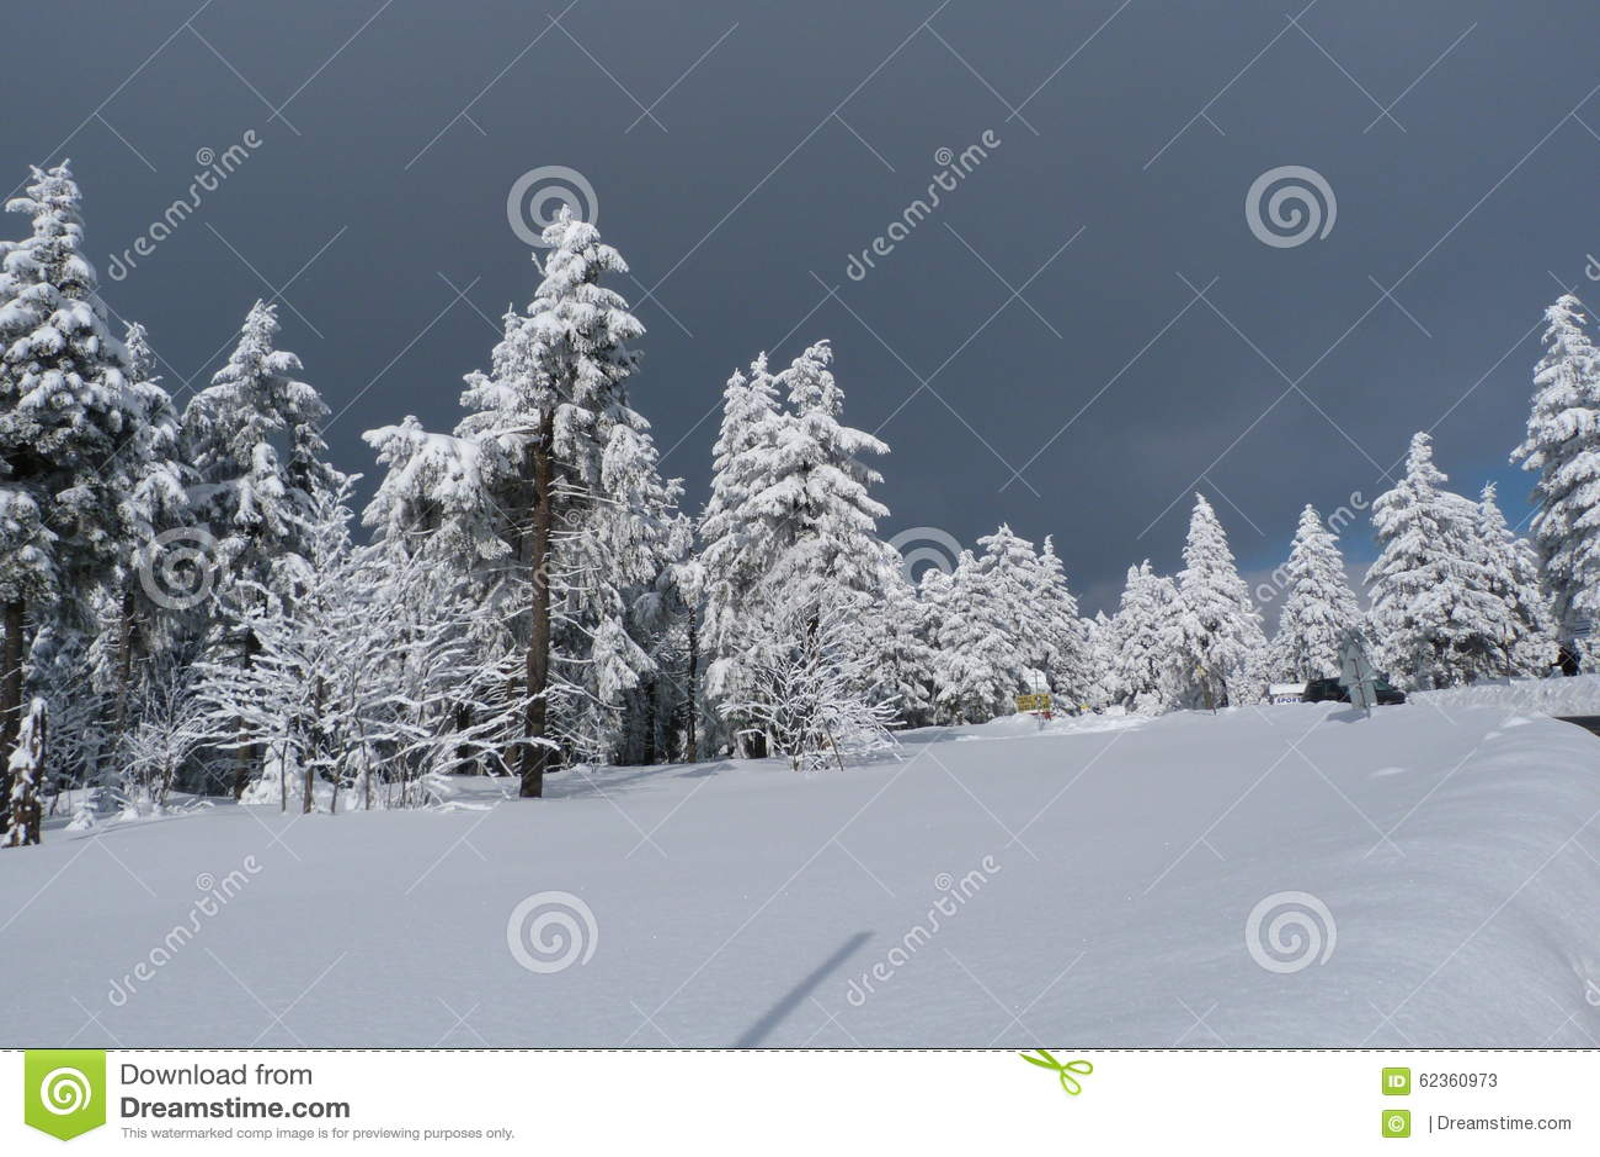 Winter, new year